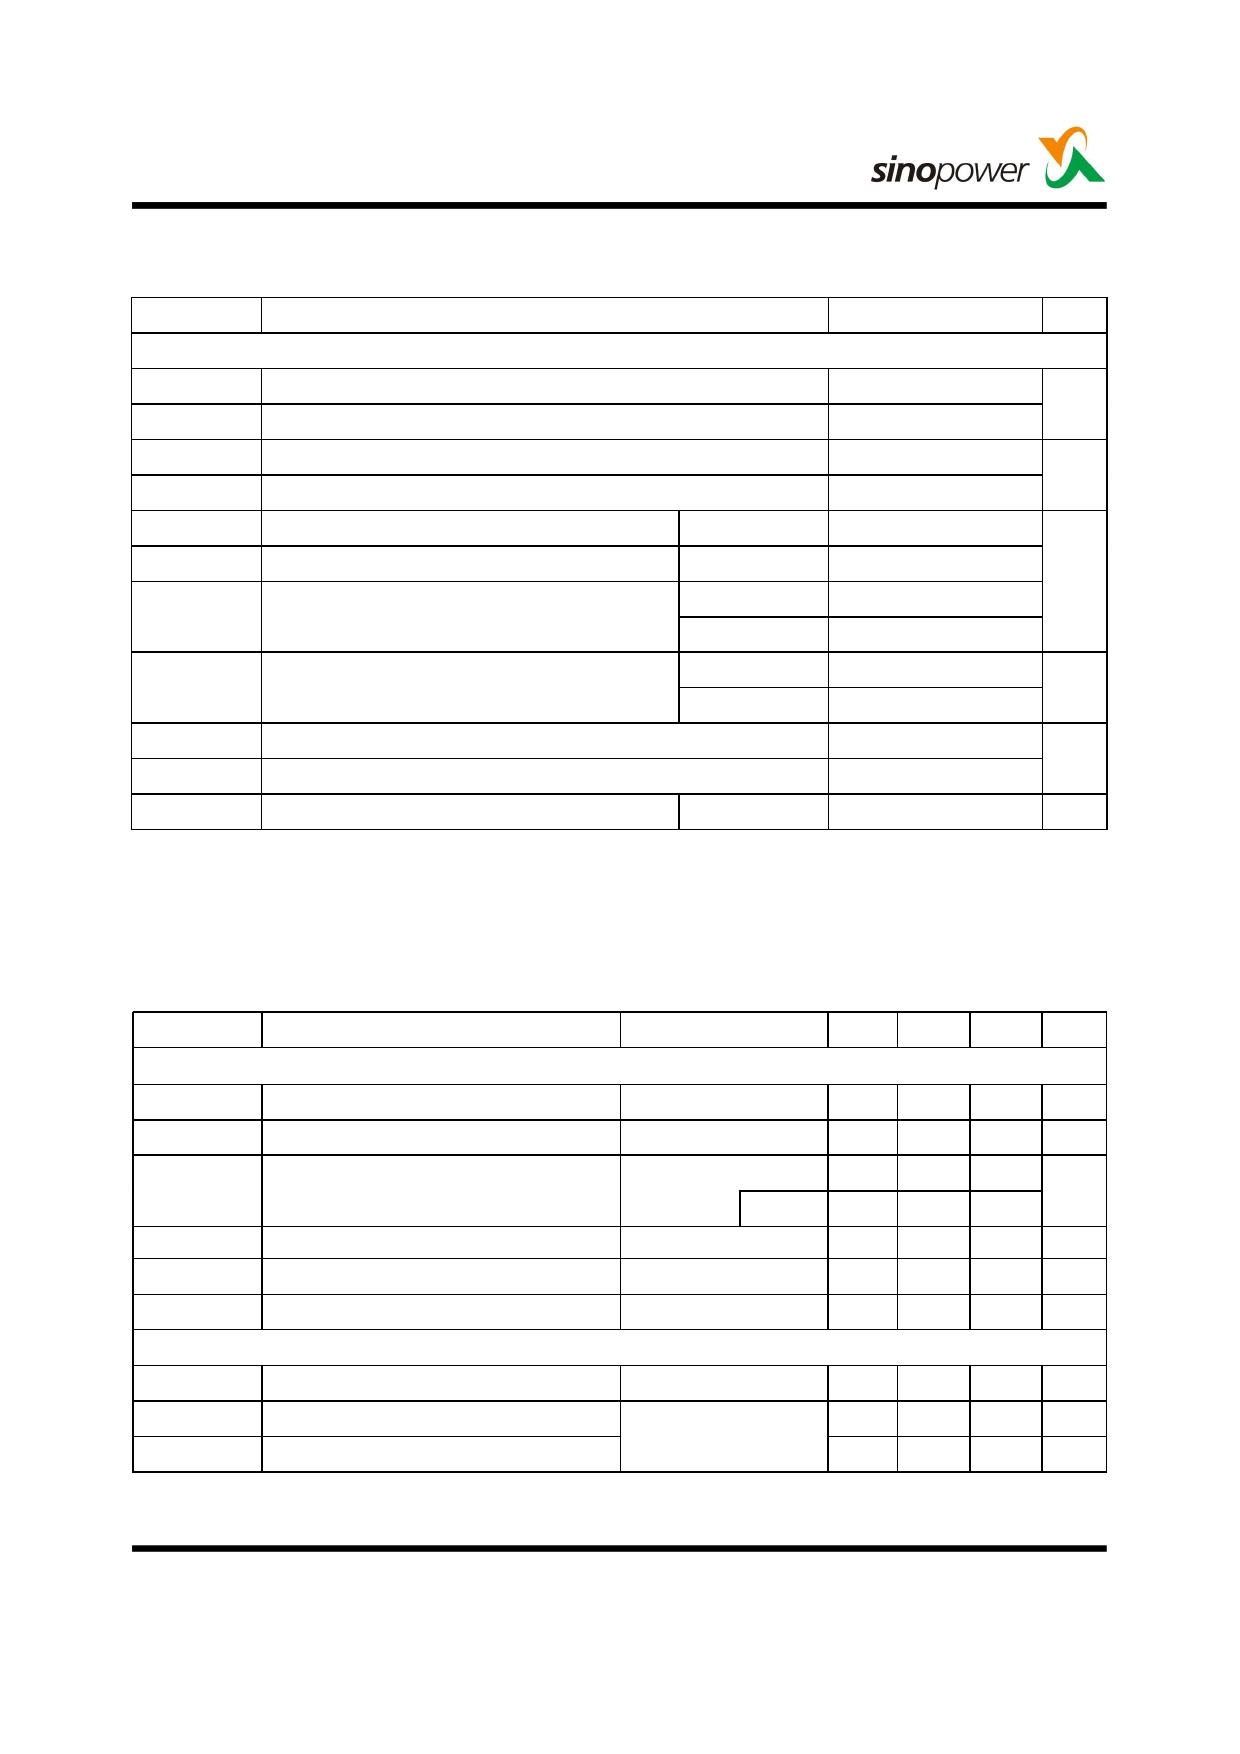 SM7580NSFH pdf, equivalent, schematic